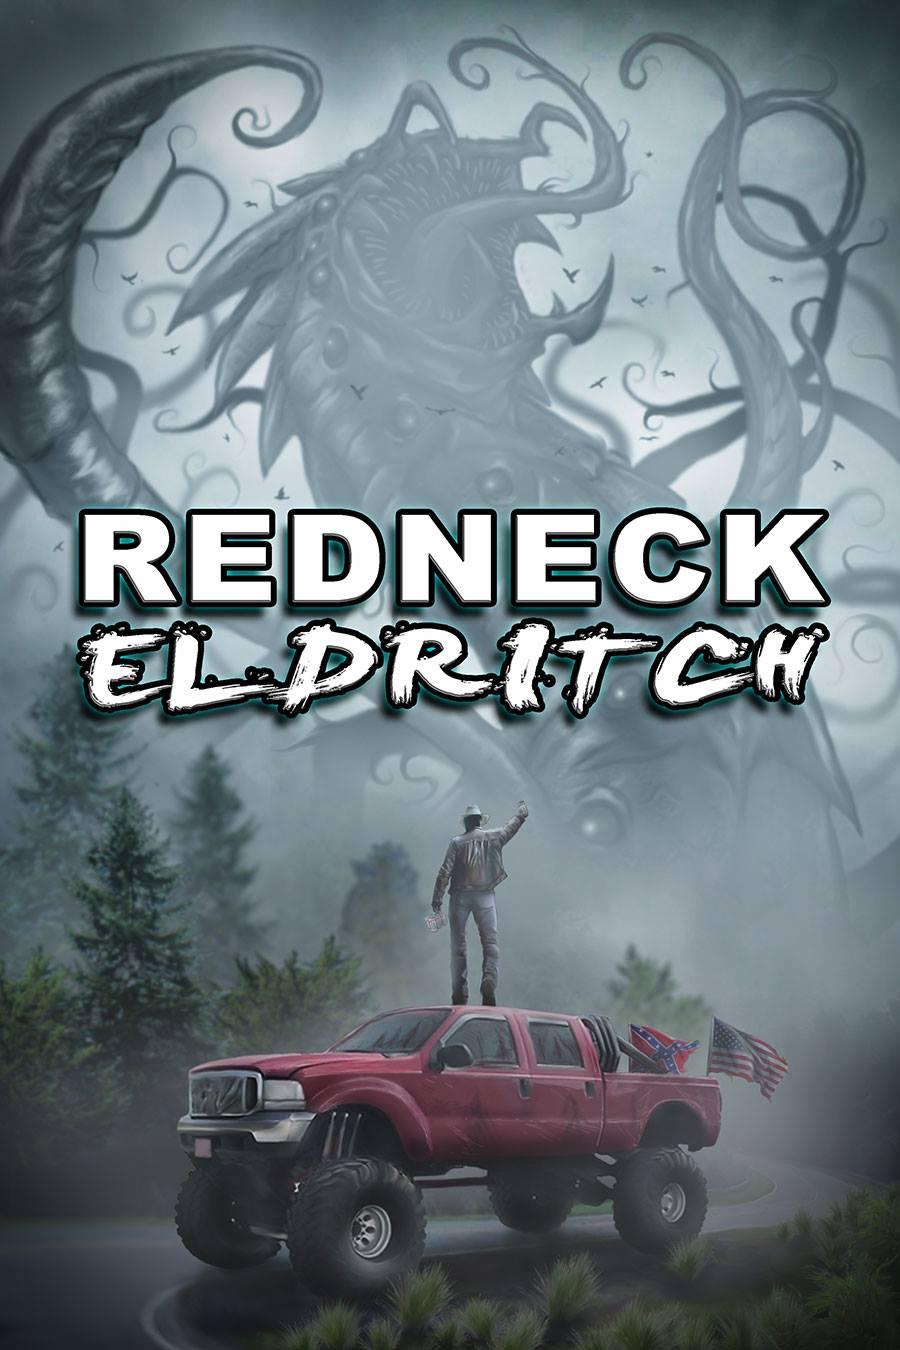 Redneck_Eldritch_cover